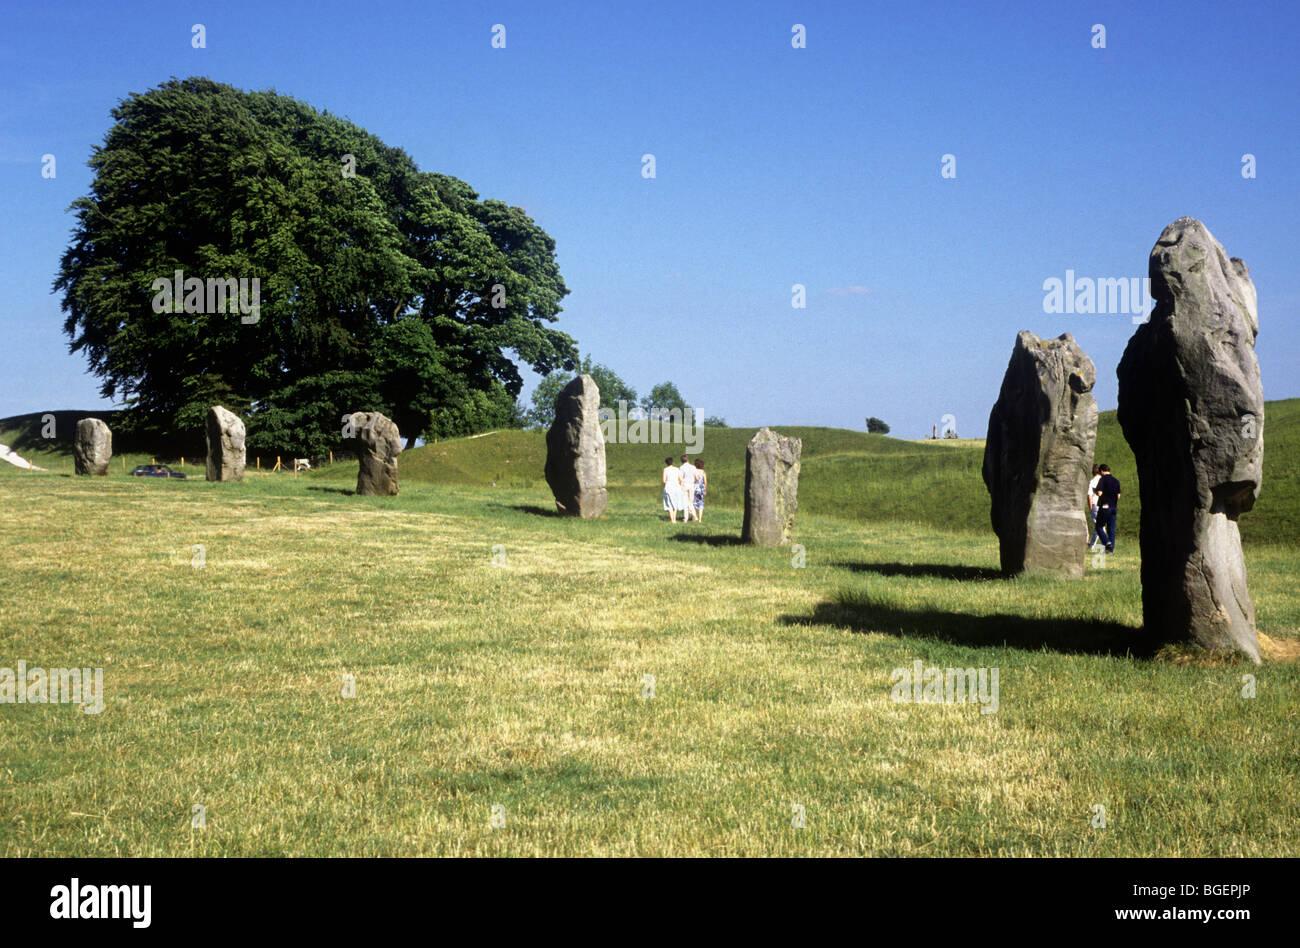 Avebury Wiltshire English prehistoric prehistory stone circle circles England UK sarsen stones religion religious - Stock Image